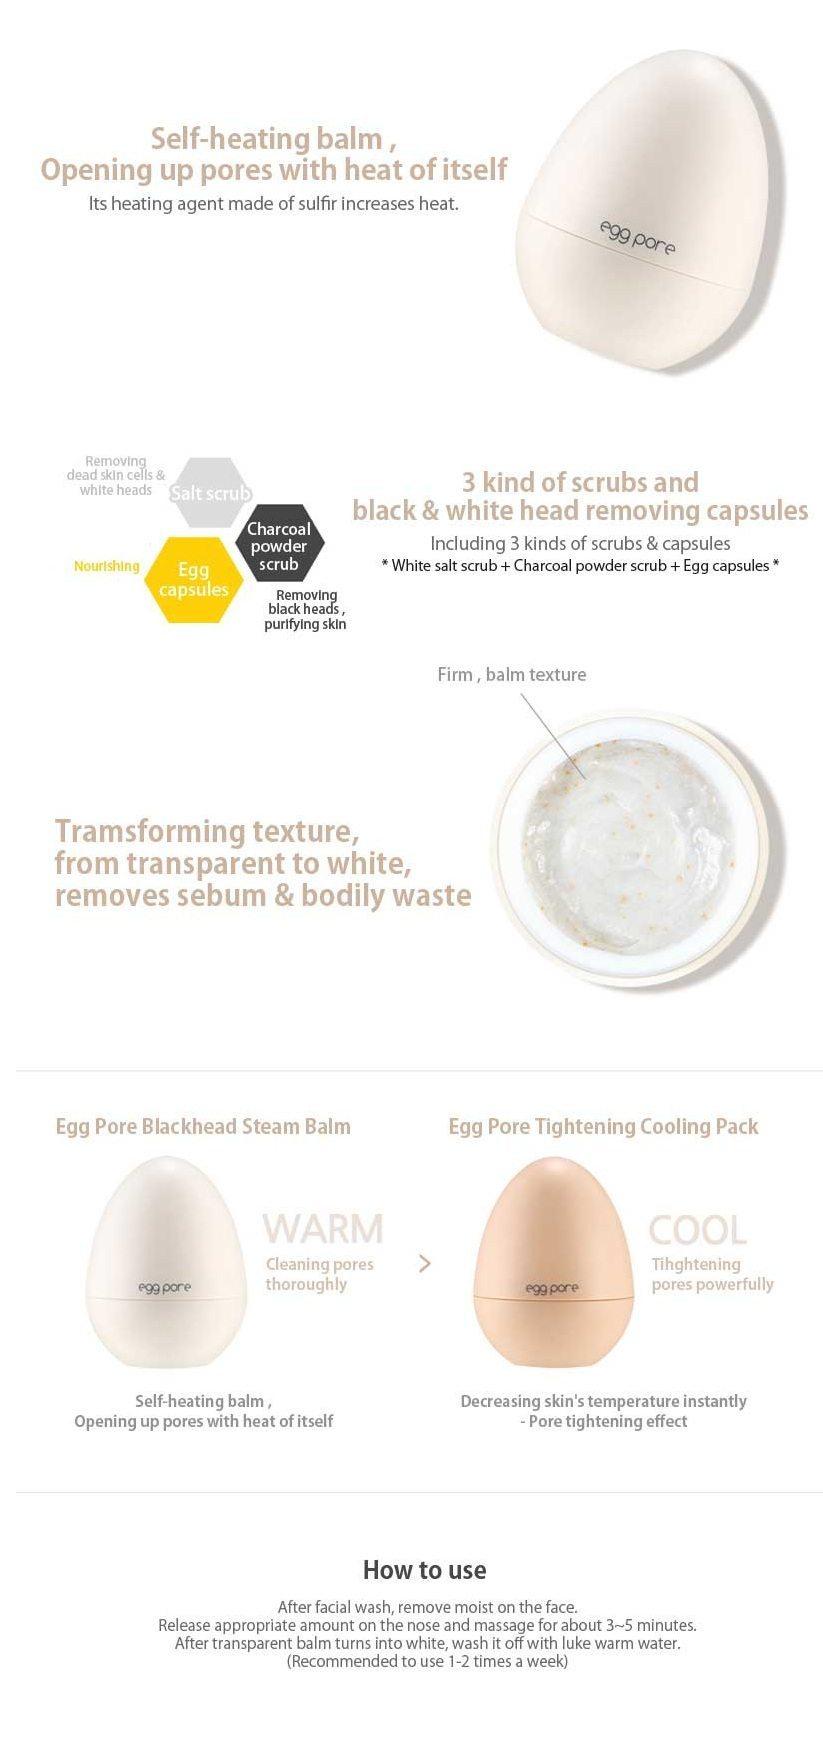 Image result for egg pore blackhead steam balm